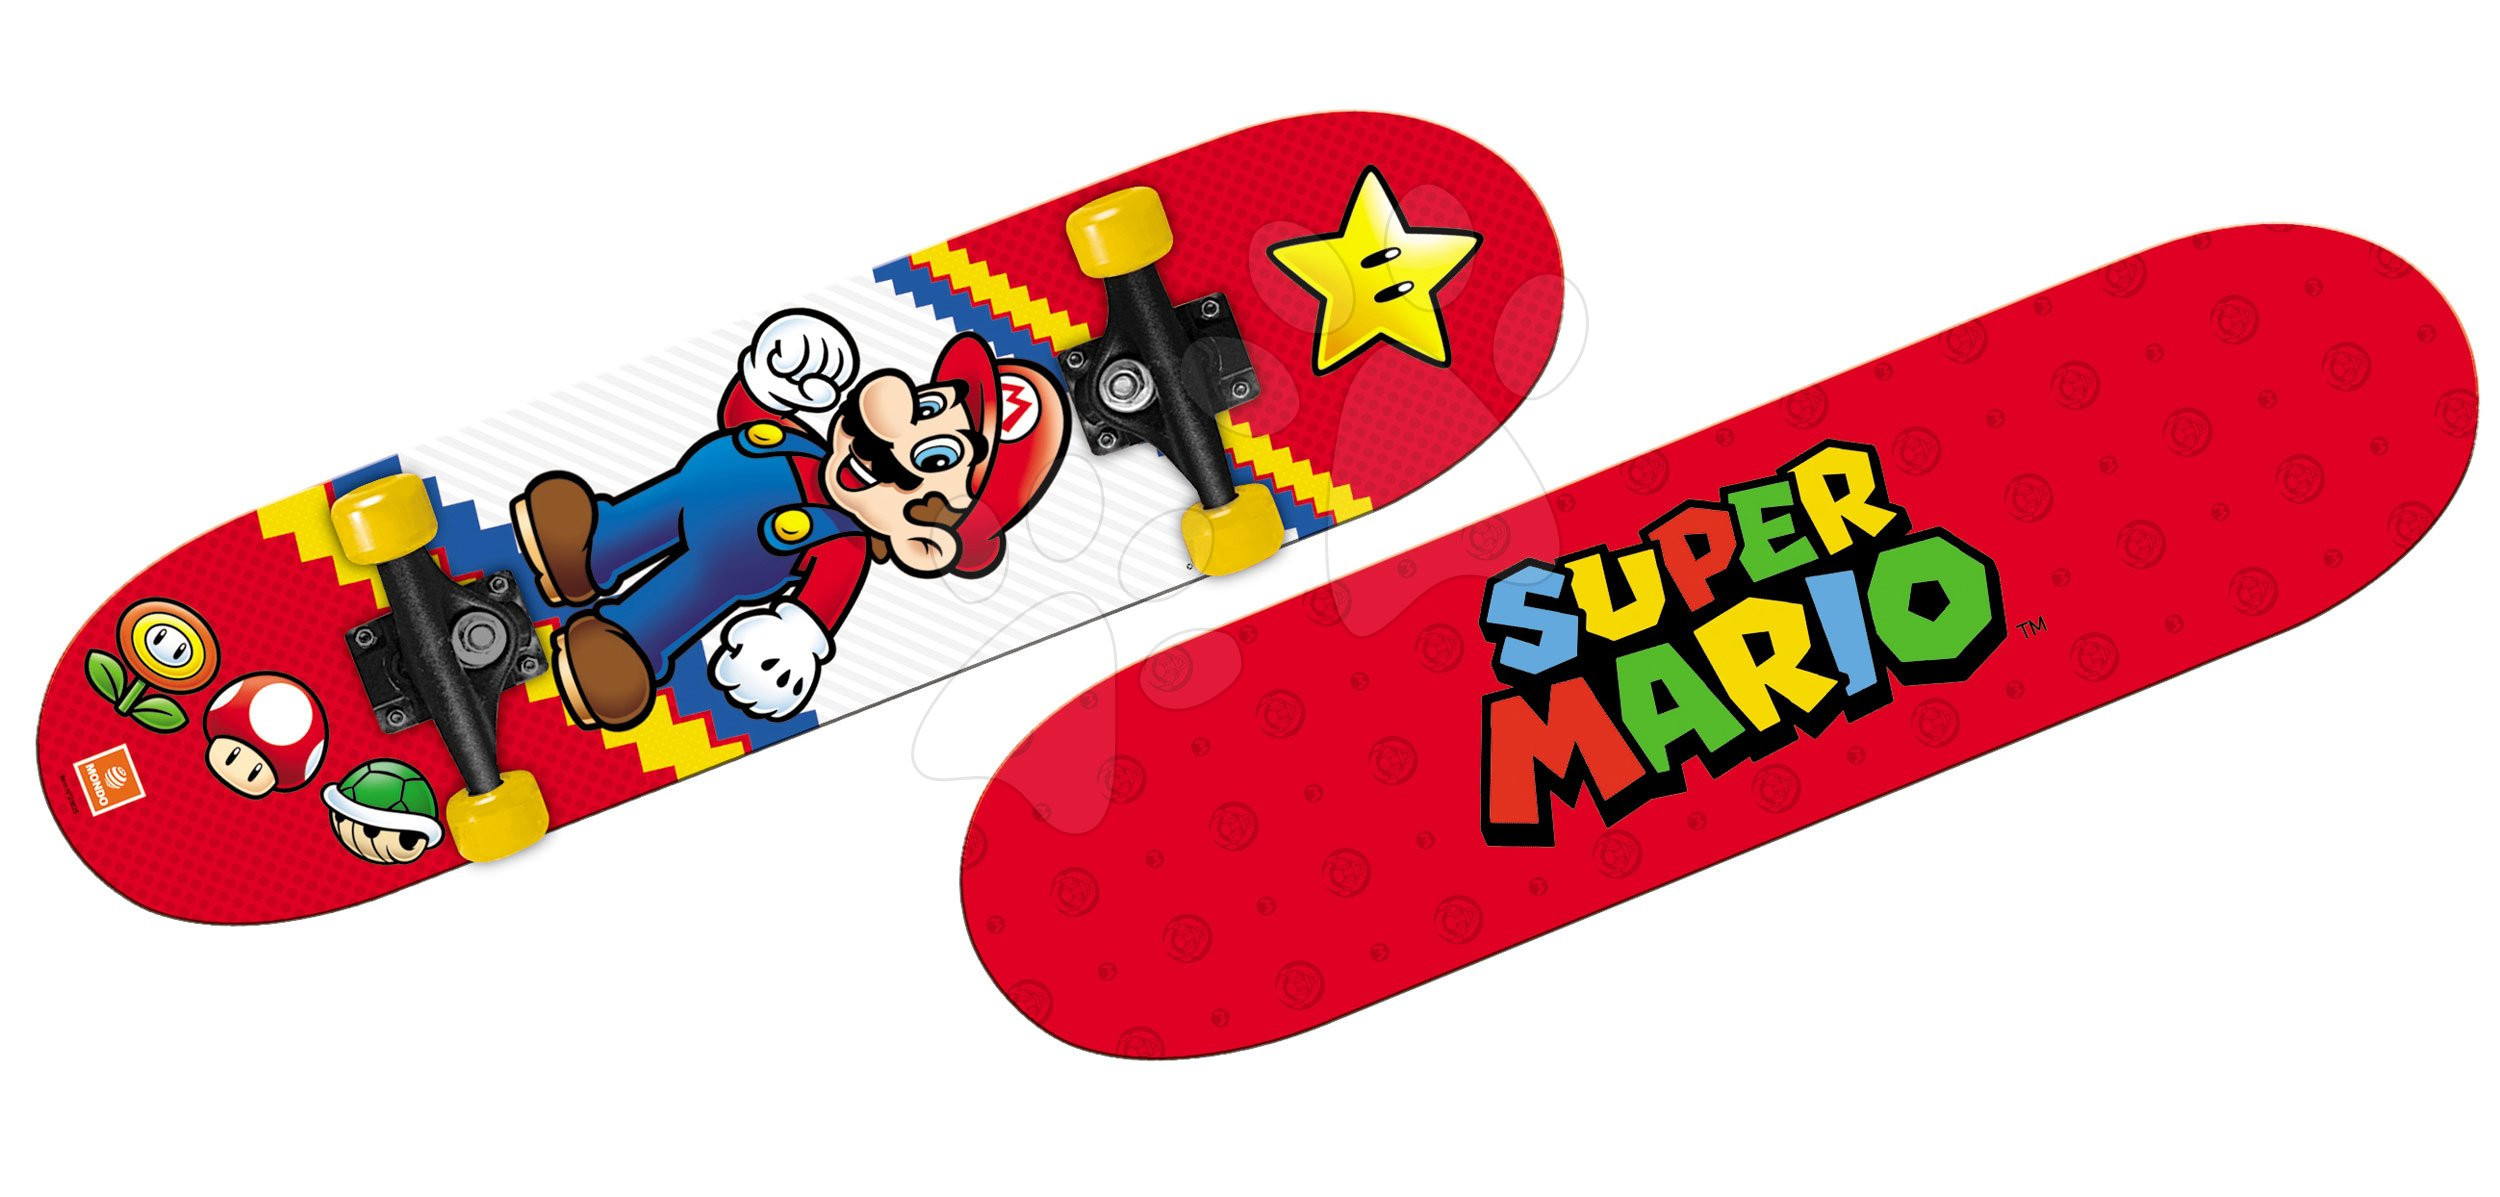 Skateboard Super Mario Mondo 80*20 cm, dvoustranný potisk, 9vrstvý, PVC 50*36 mm, PP 5